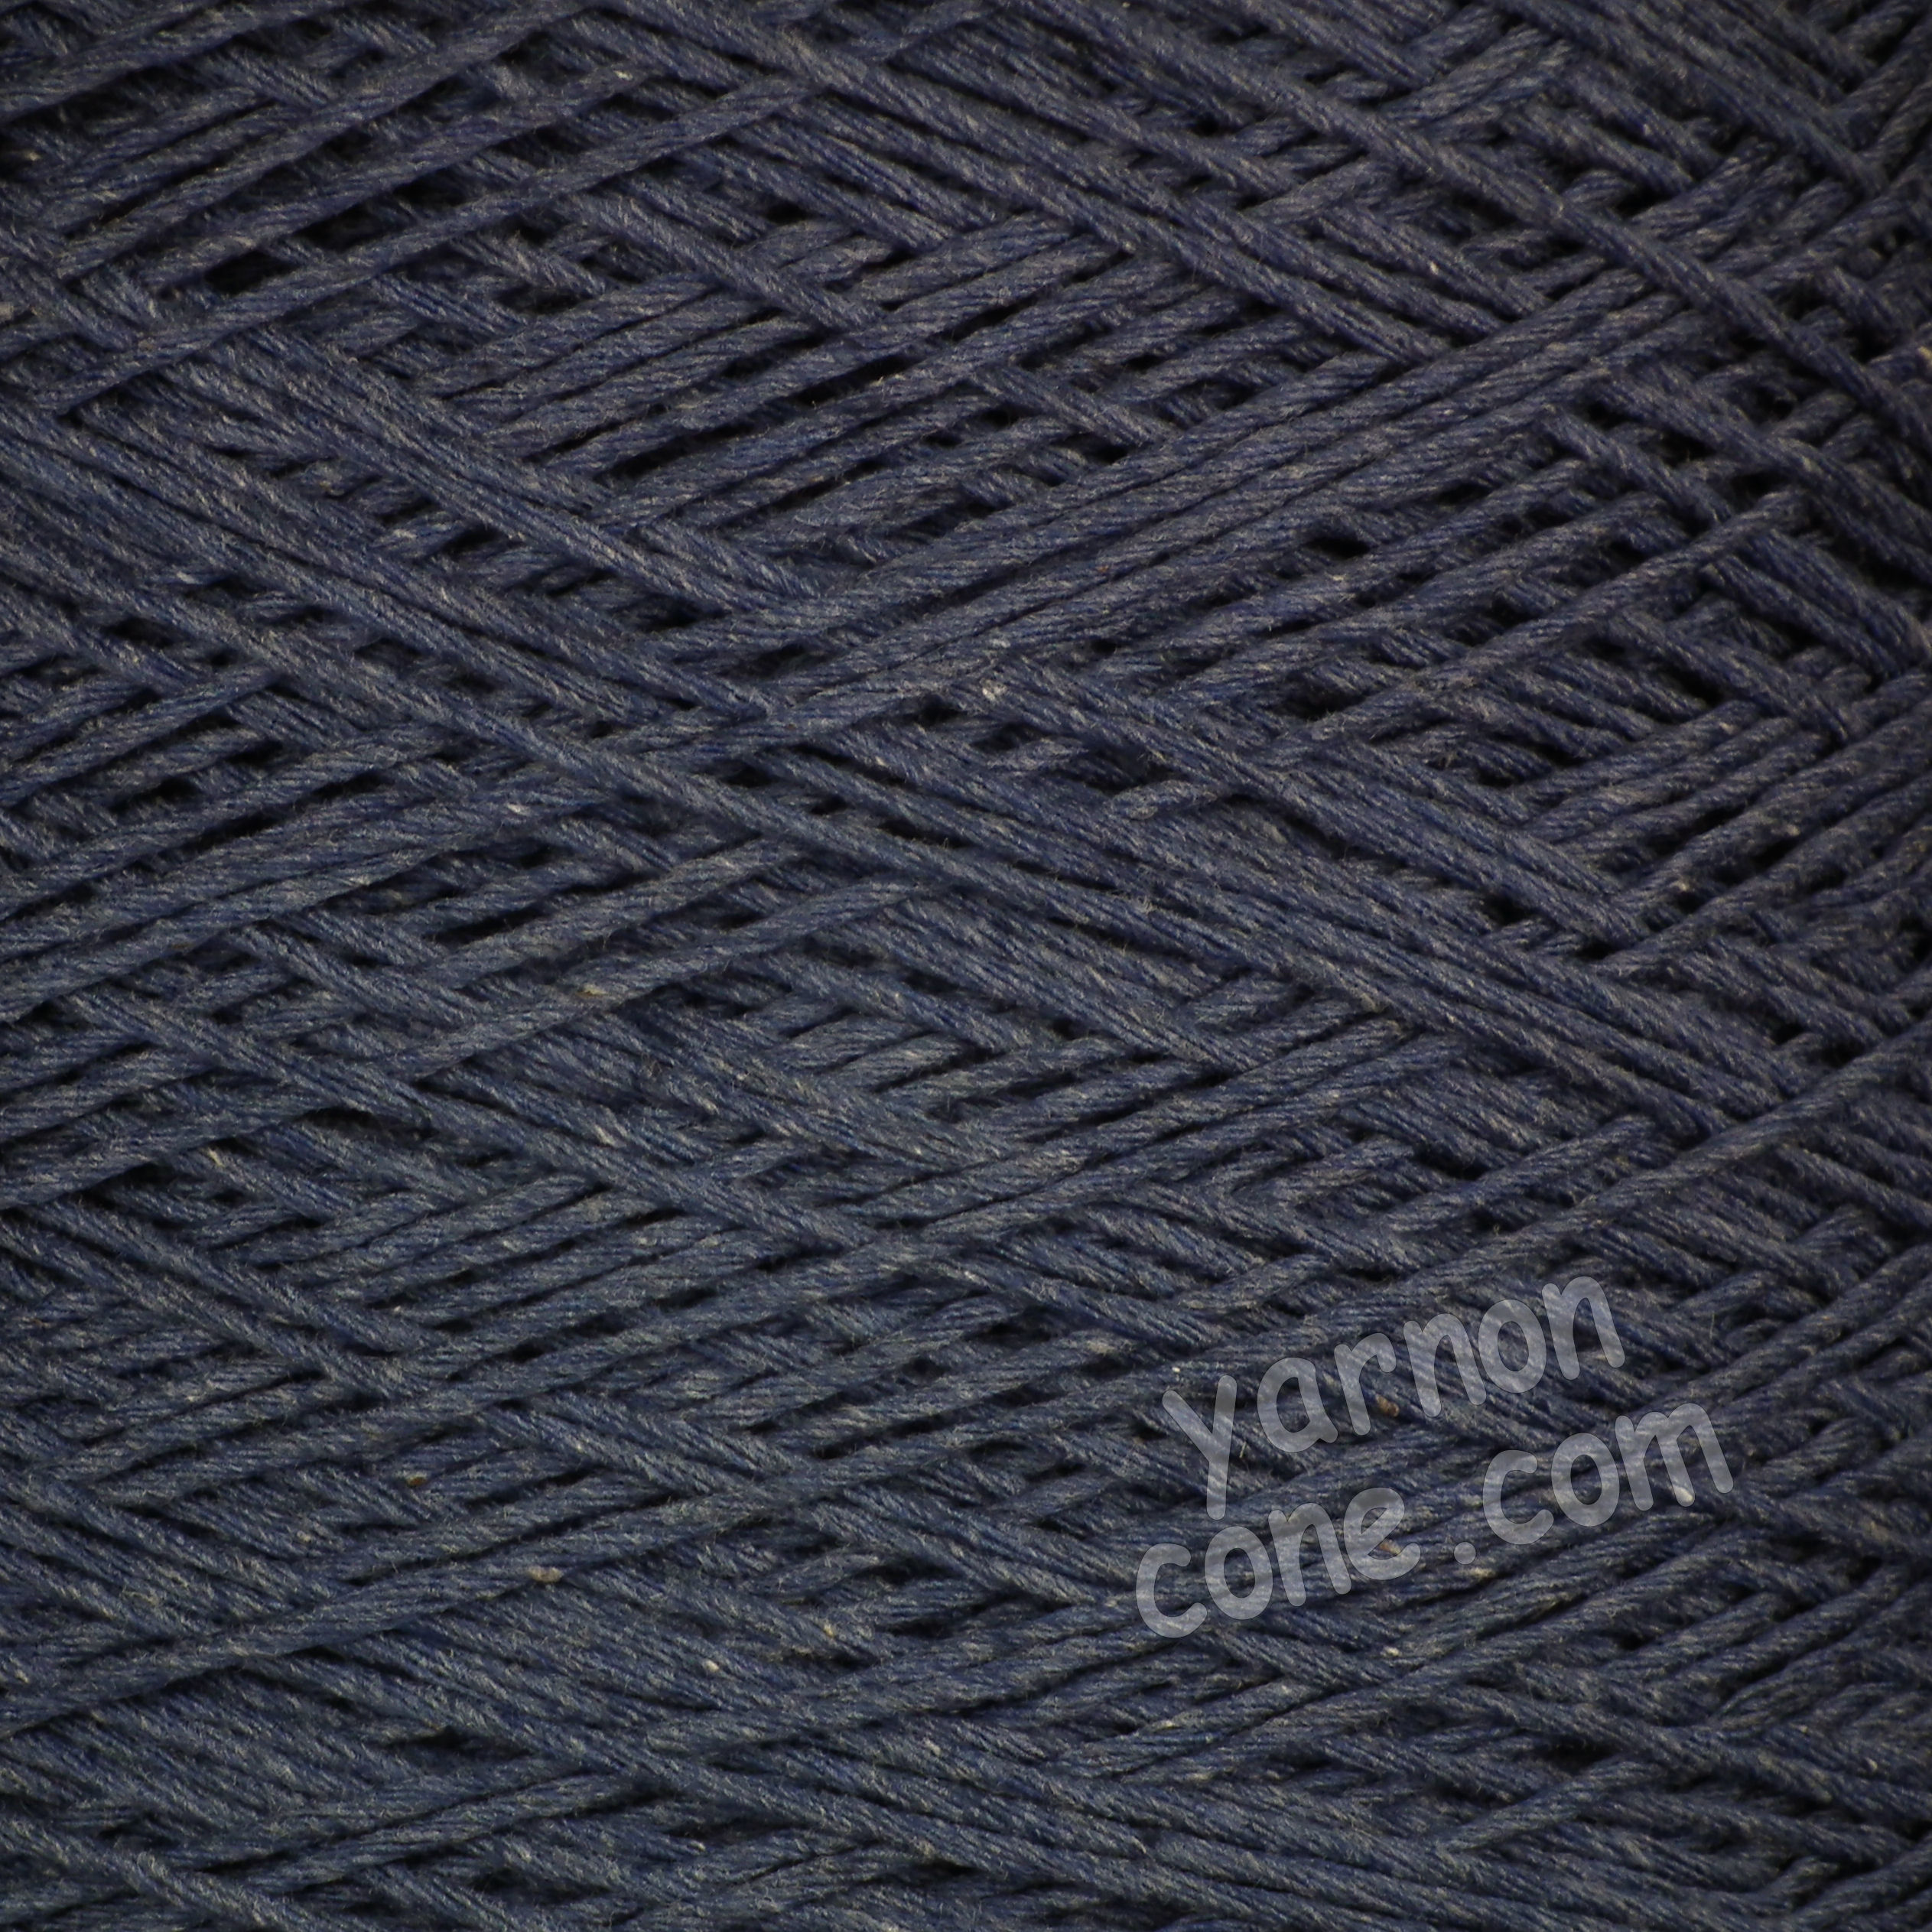 Double knitting DK soft pure cotton yarn on cone hand machine knitting weaving crochet indigo blue